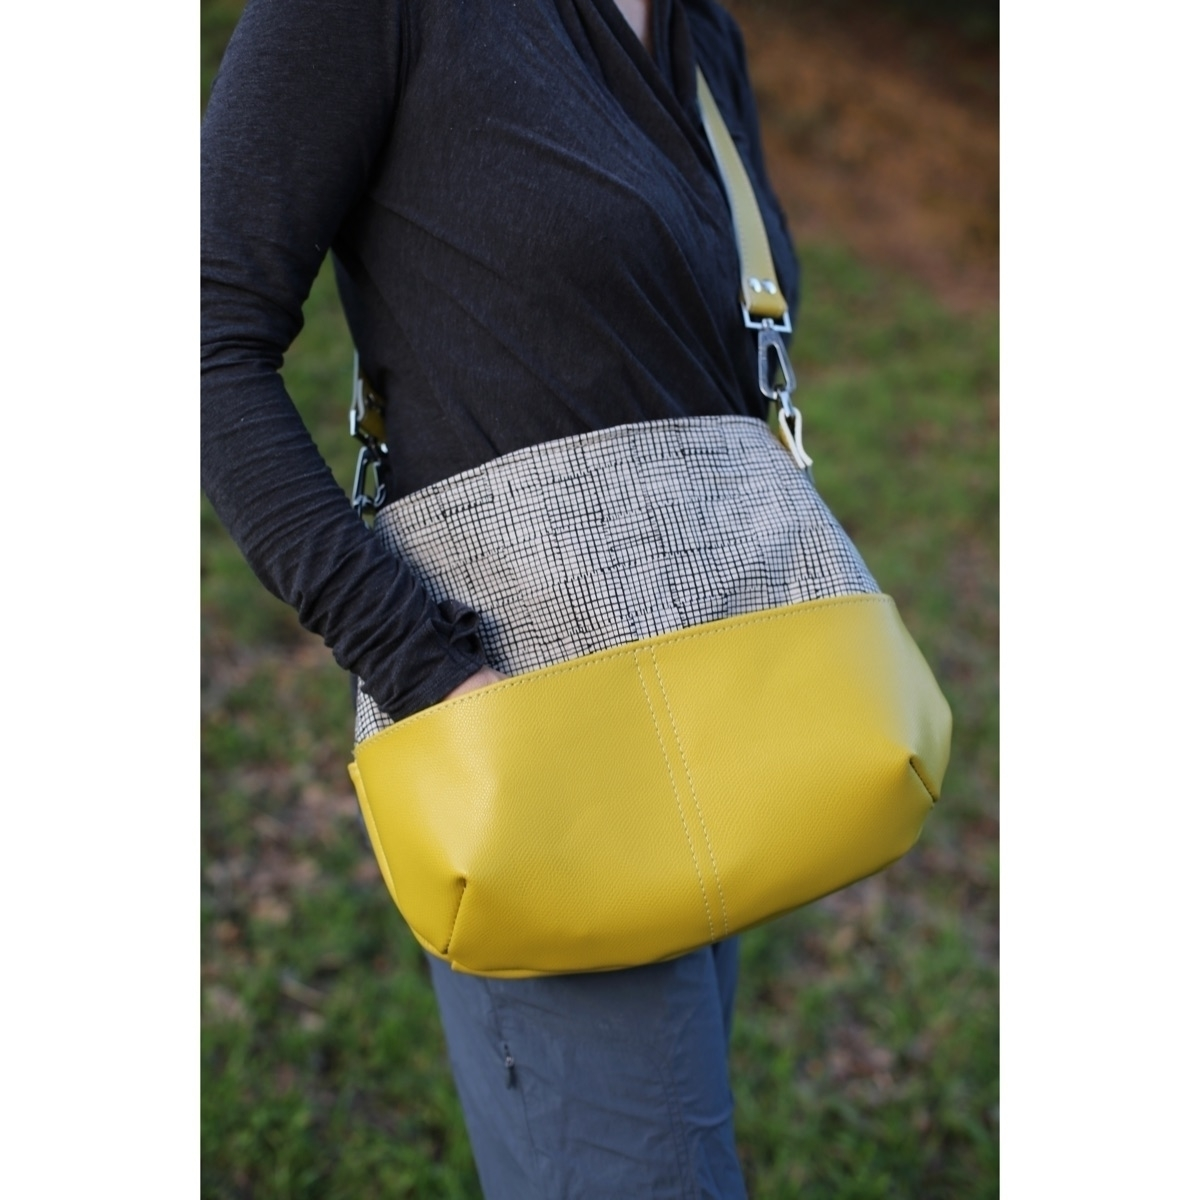 latest bag. design - handmadebag - entropyalwayswins   ello